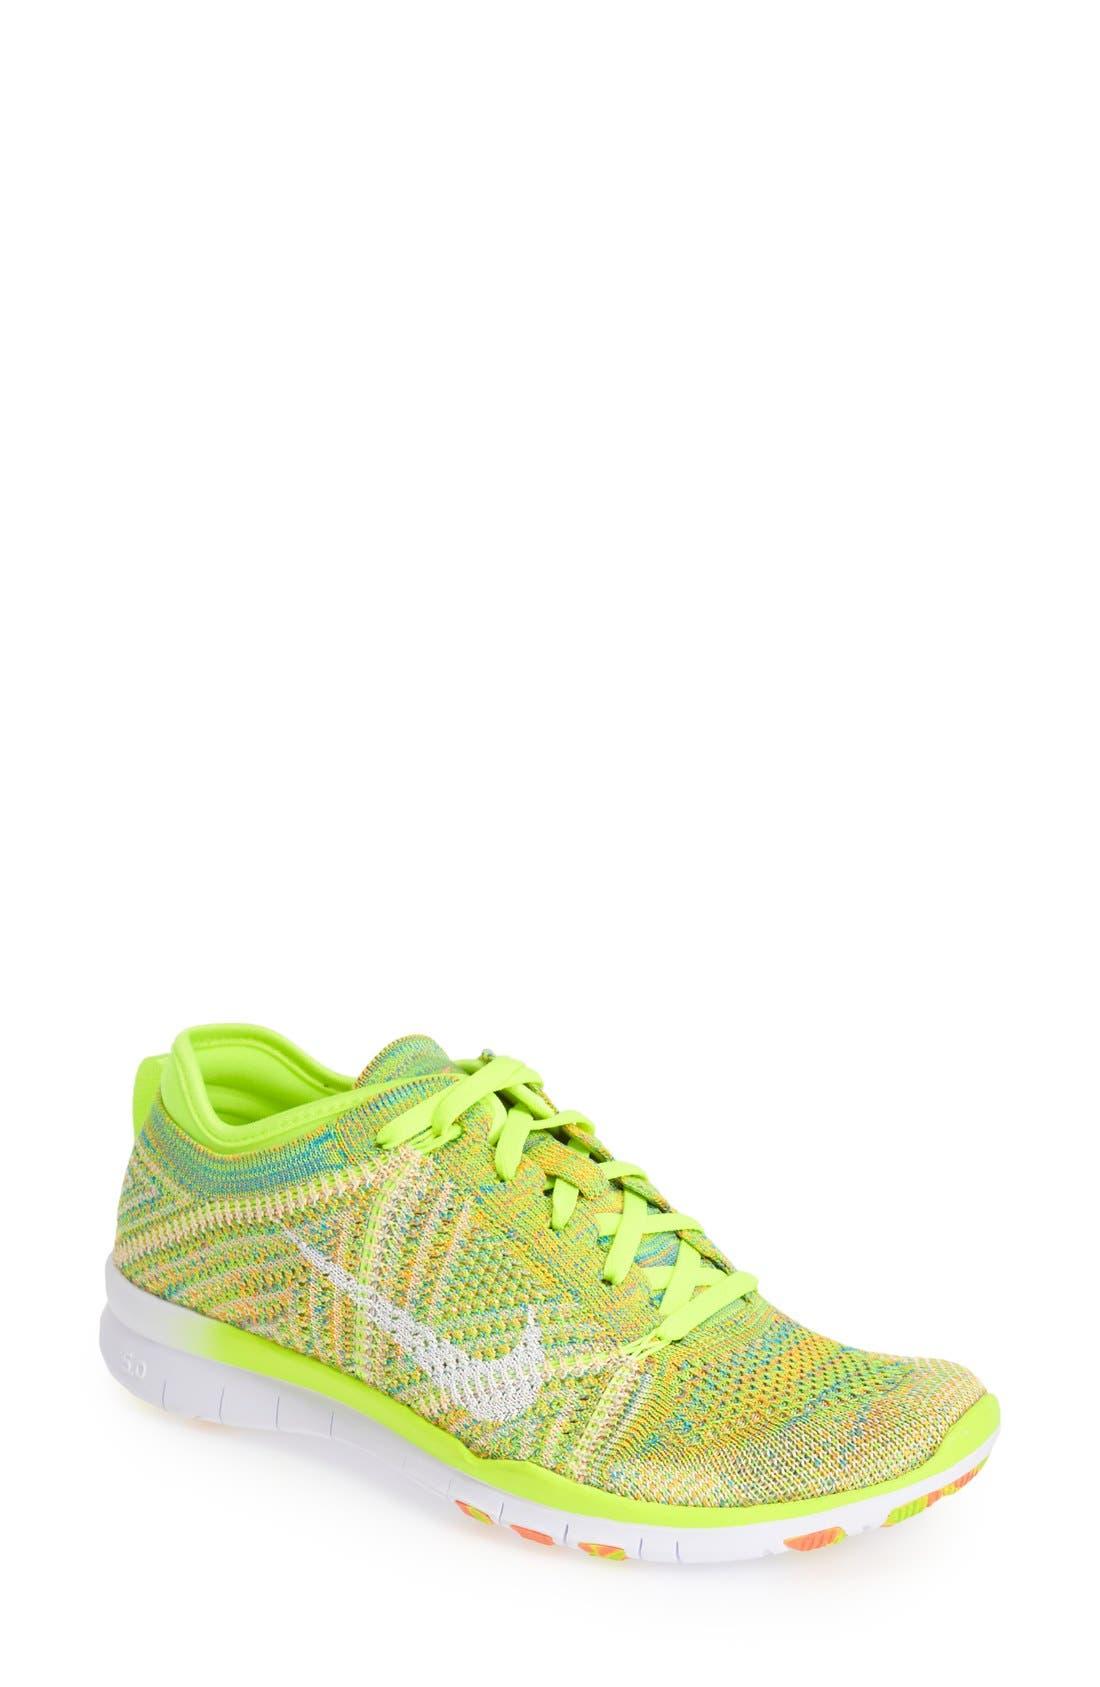 ,                             'Free Flyknit 5.0 TR' Training Shoe,                             Main thumbnail 52, color,                             700